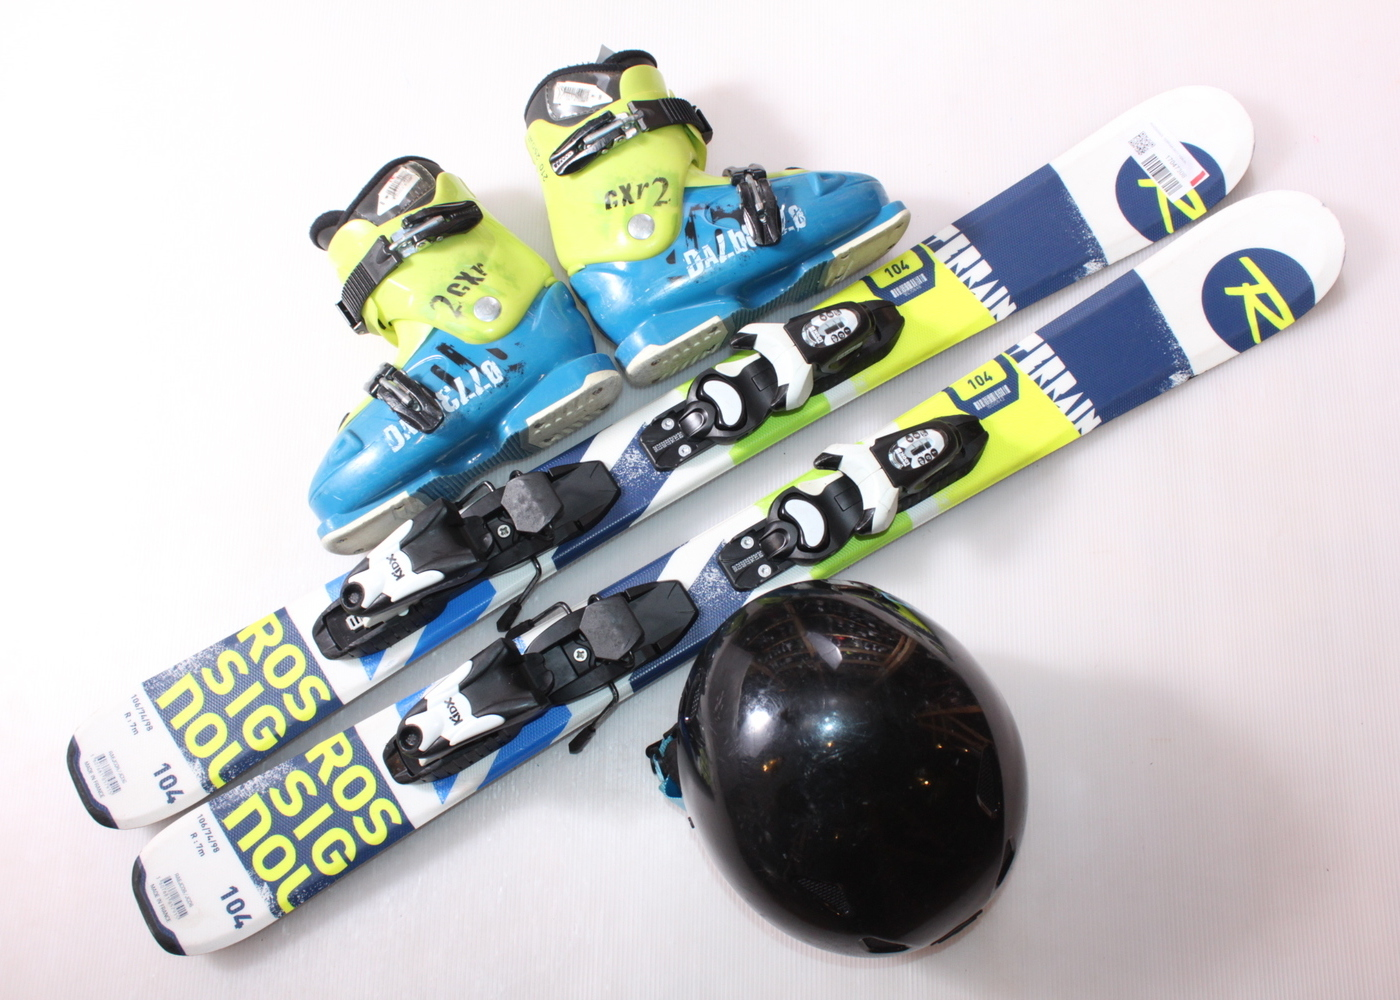 Dětské lyže ROSSIGNOL TERRAIN BOY 104 cm + lyžáky  33EU + helma